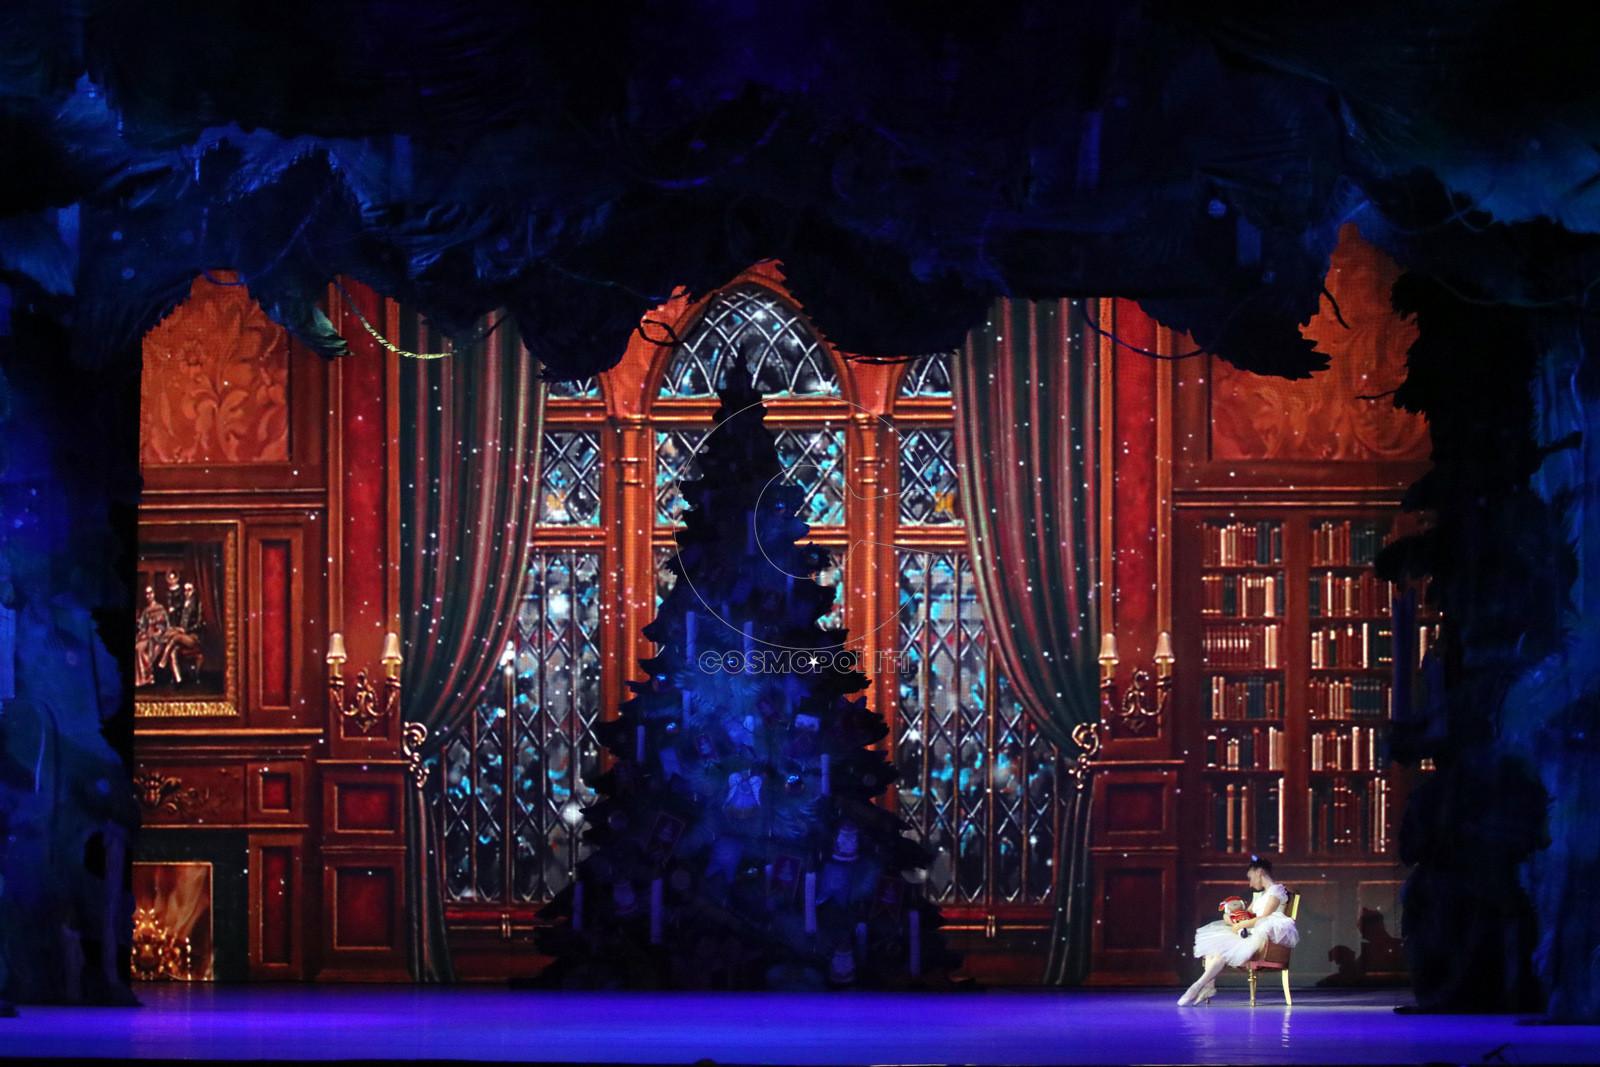 aca82a0fd9e Όλη η μαγεία των Χριστουγέννων στο Christmas Theater, με τη μοναδική  παράσταση του Καρυοθραύστη να συναρπάζει, να συγκινεί, να δίνει χαρά σε  μικρούς και ...